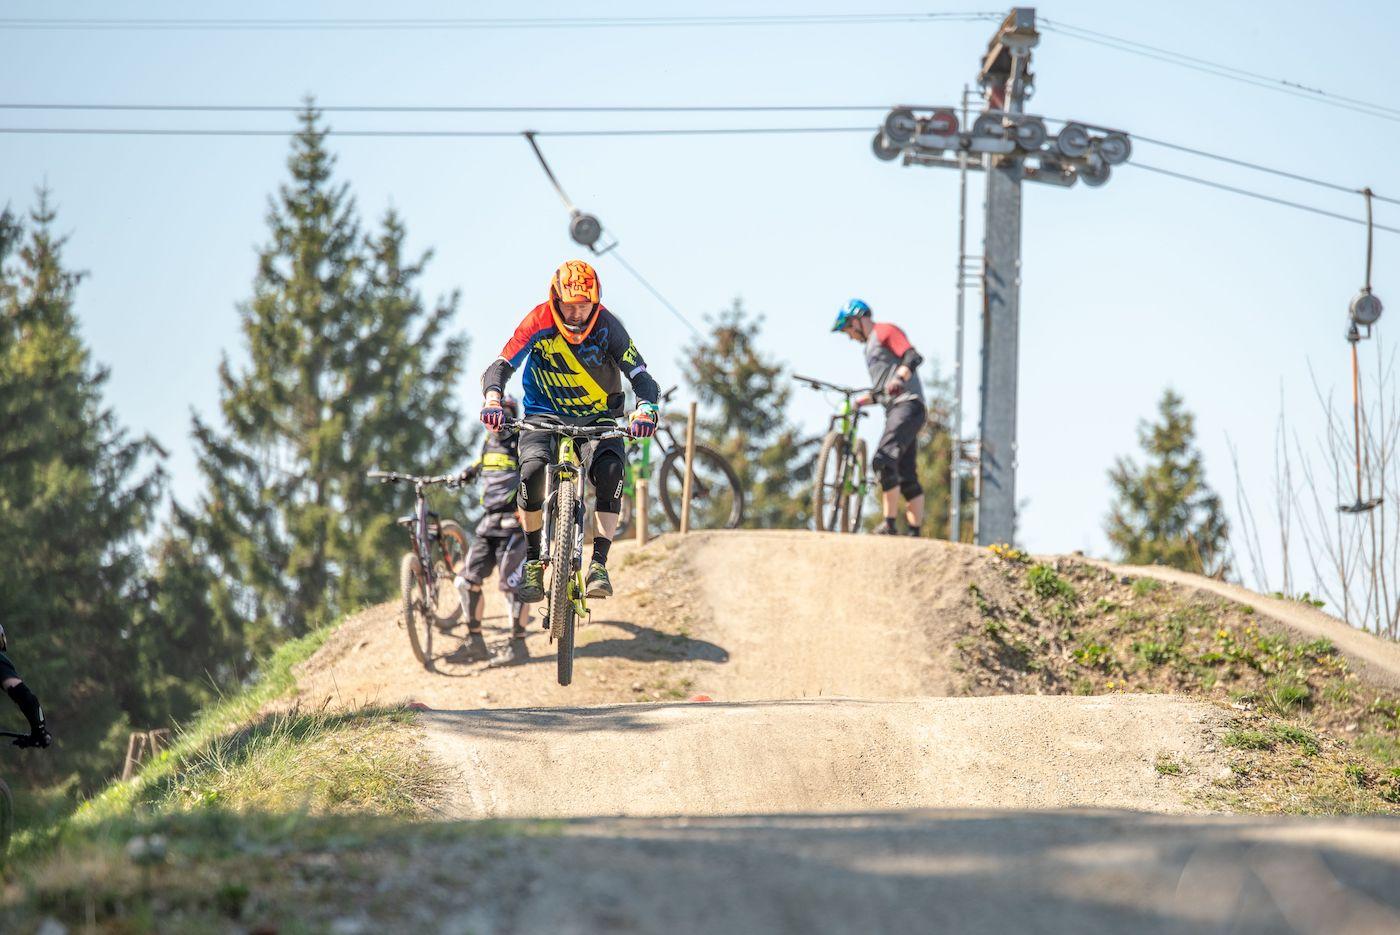 MTB Sprung und Drop Kurs in Olpe - Fahrtechnik Training Rock my Trail Bikeschule